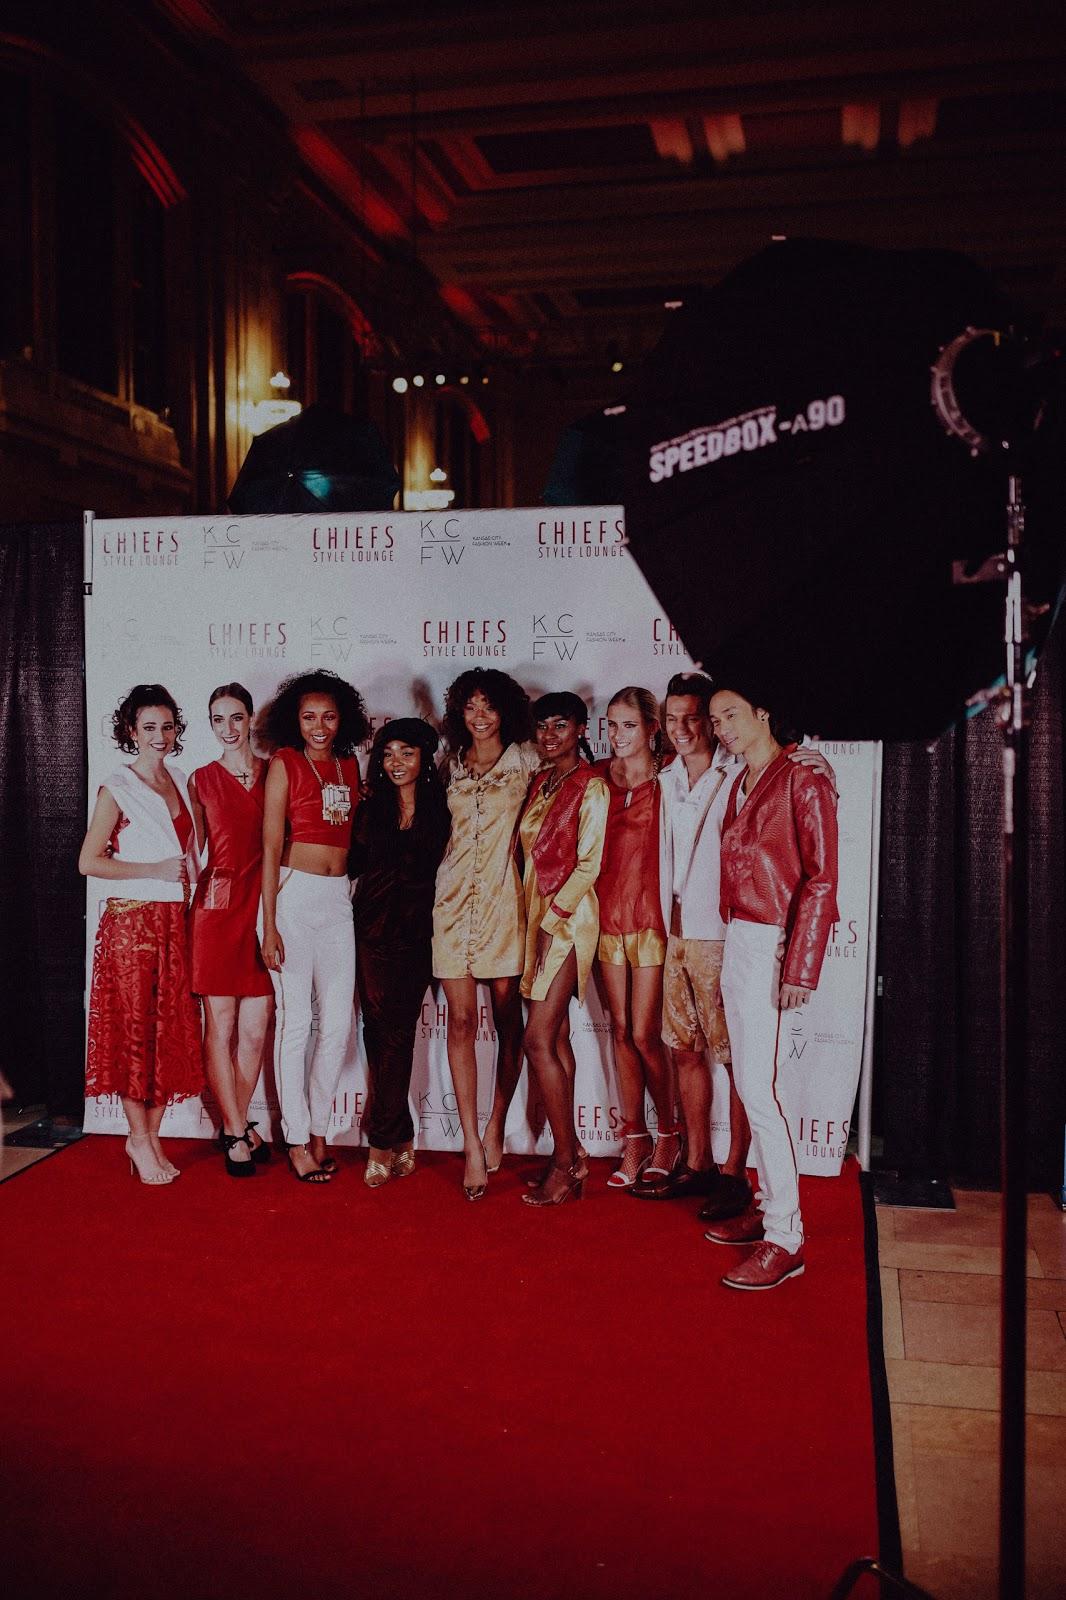 Natasha Shangari KCFW models on the red carpet